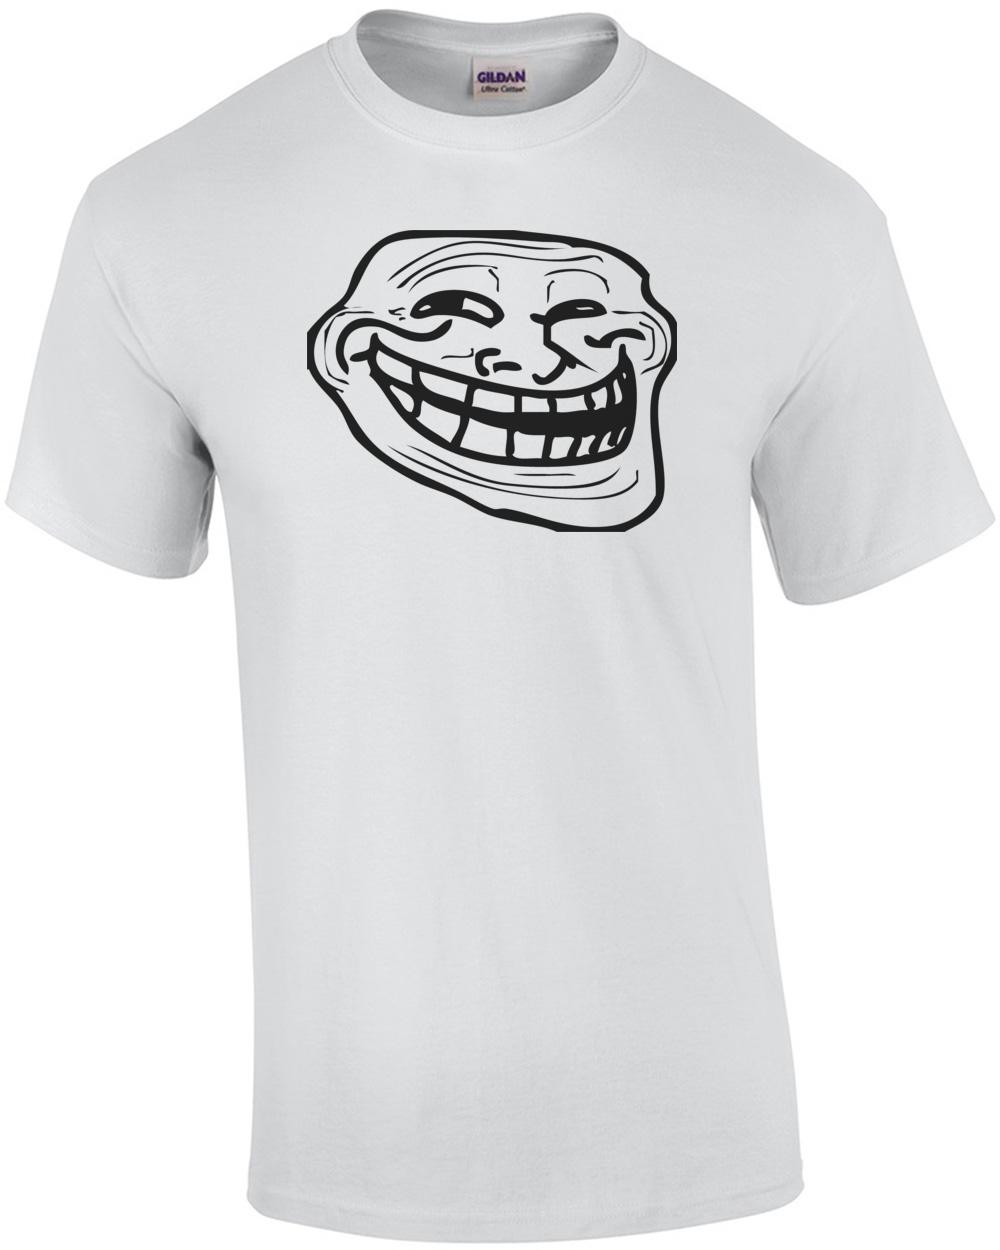 Troll Face t Shirts Troll Face The T-shirt